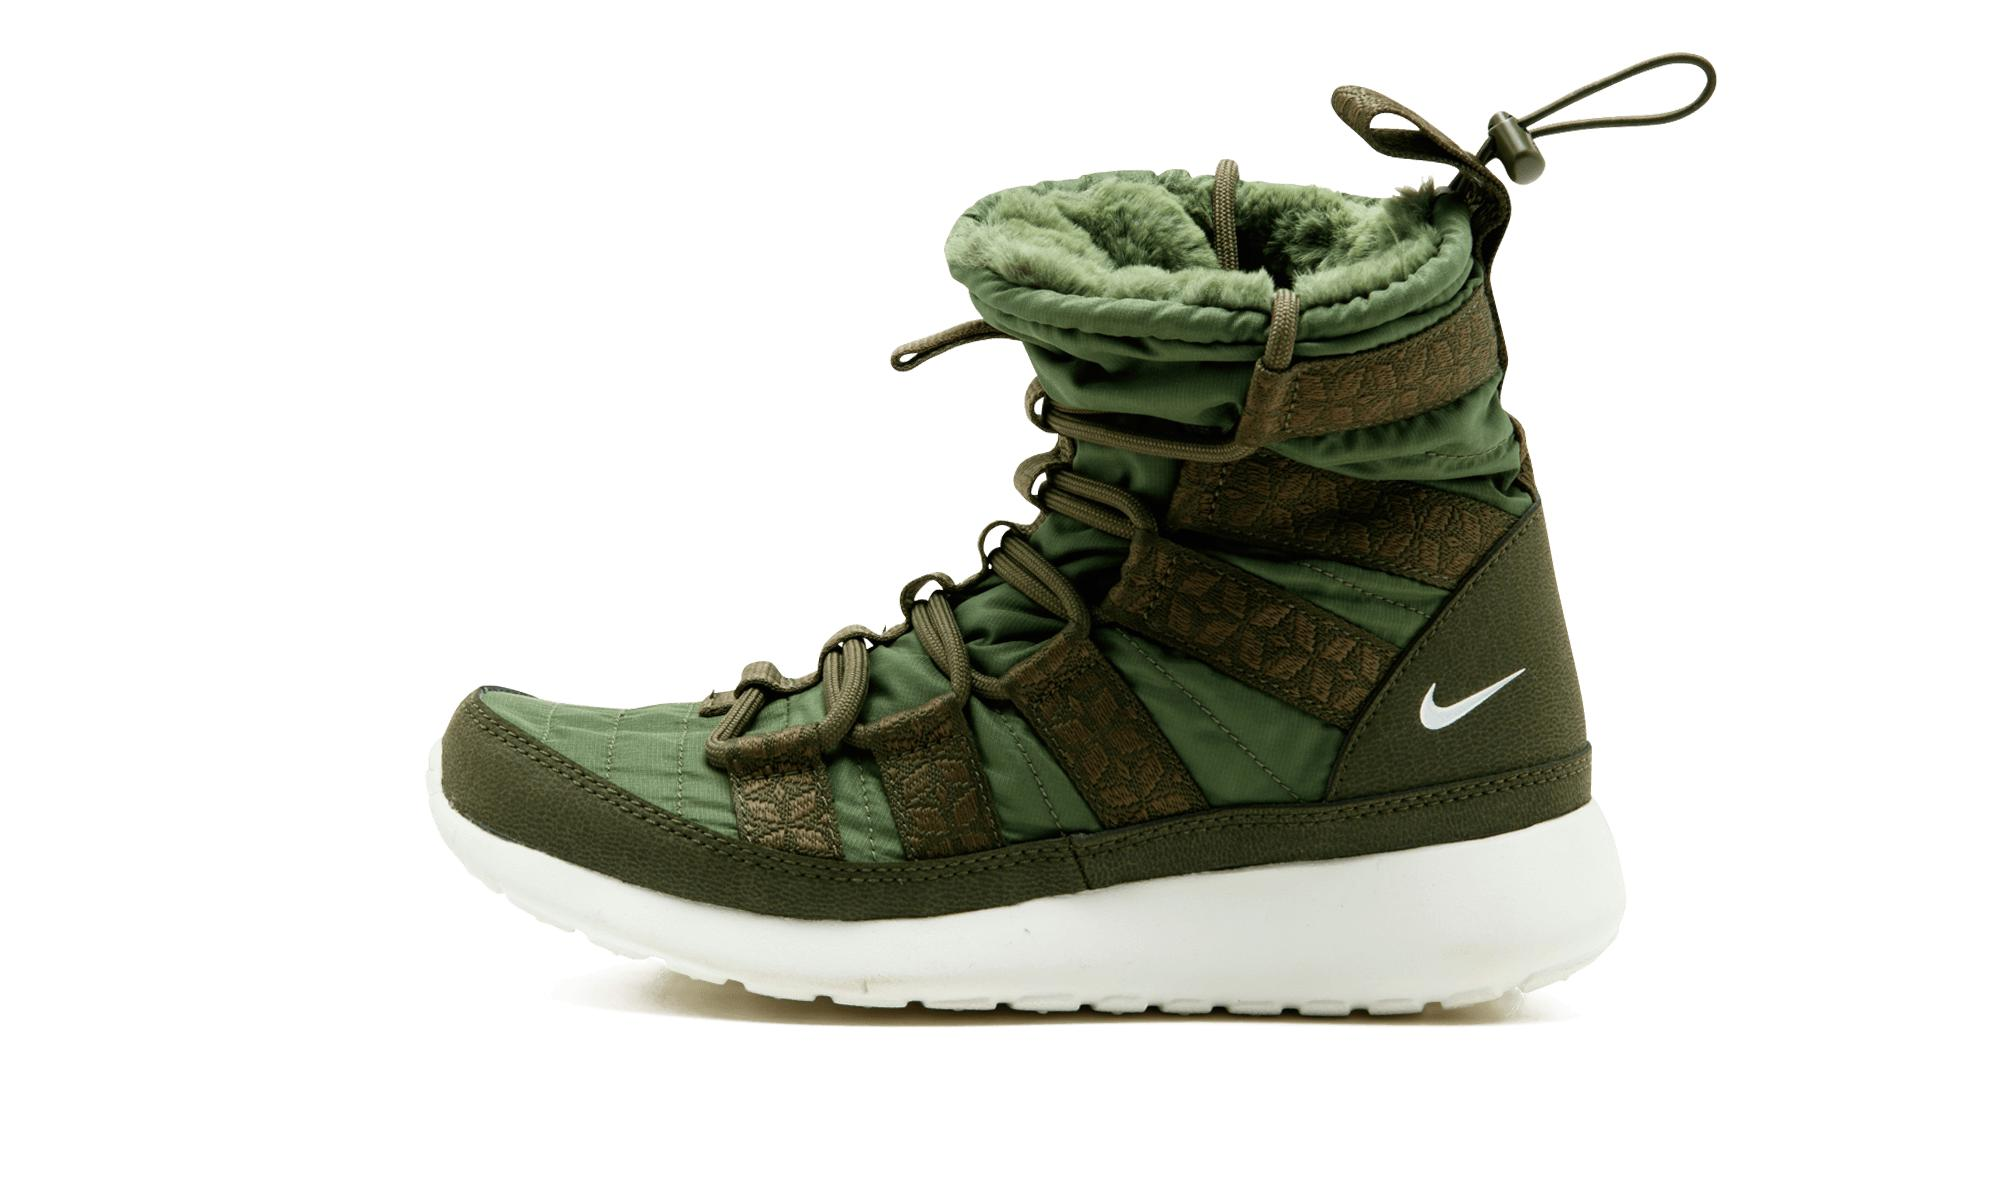 7cb3f46104c73 Lyst - Nike Wmns Rosherun Hi Sneakerboot in Green